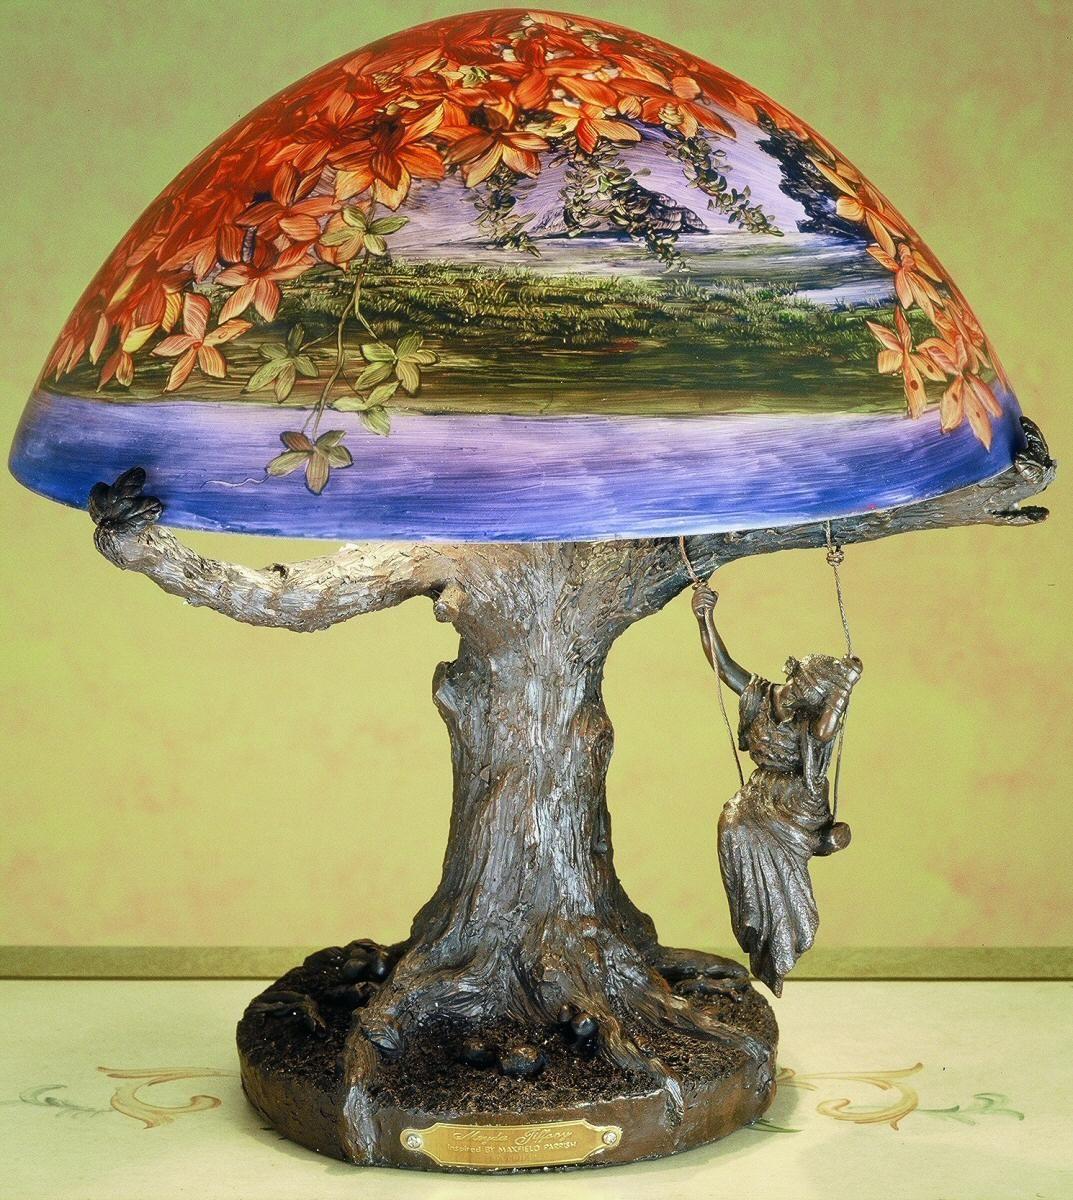 Meyda Tiffany Parrish Reveries Reverse Painted Table Lamp 32108 | LampsUSA